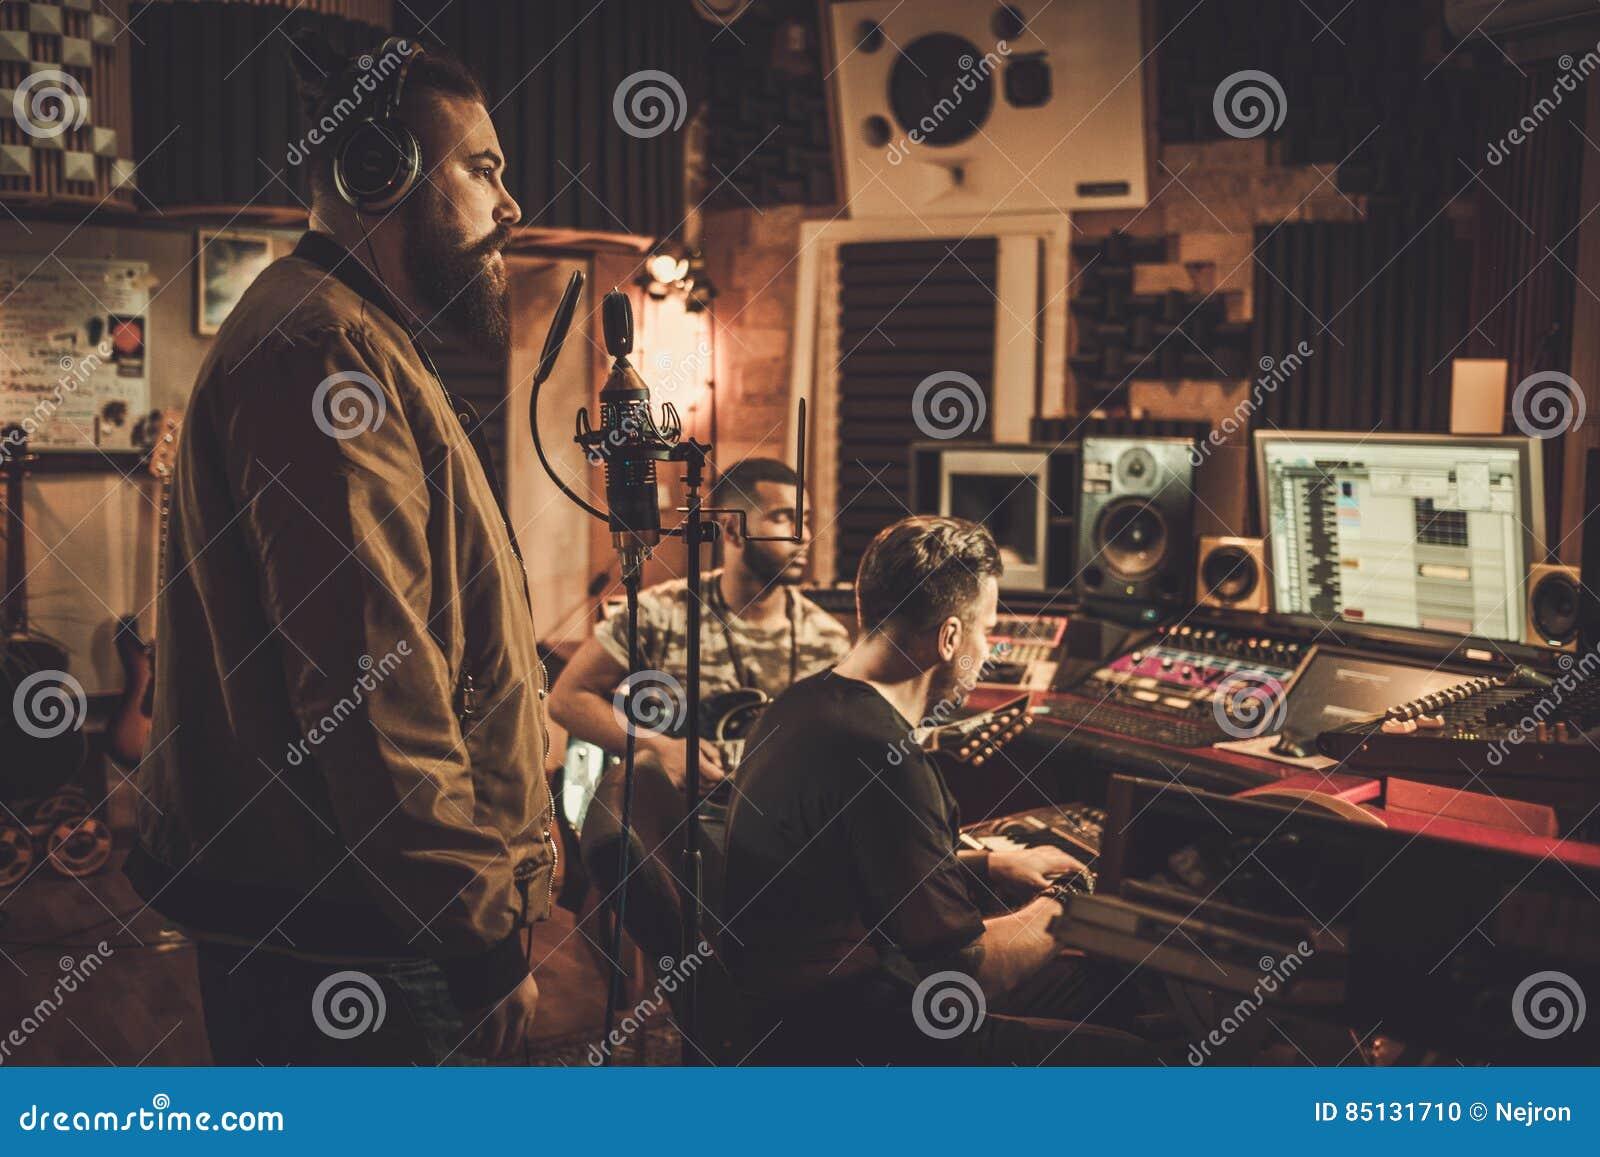 Berufsmusikband-Aufnahmelied in Butikenaufnahme stu